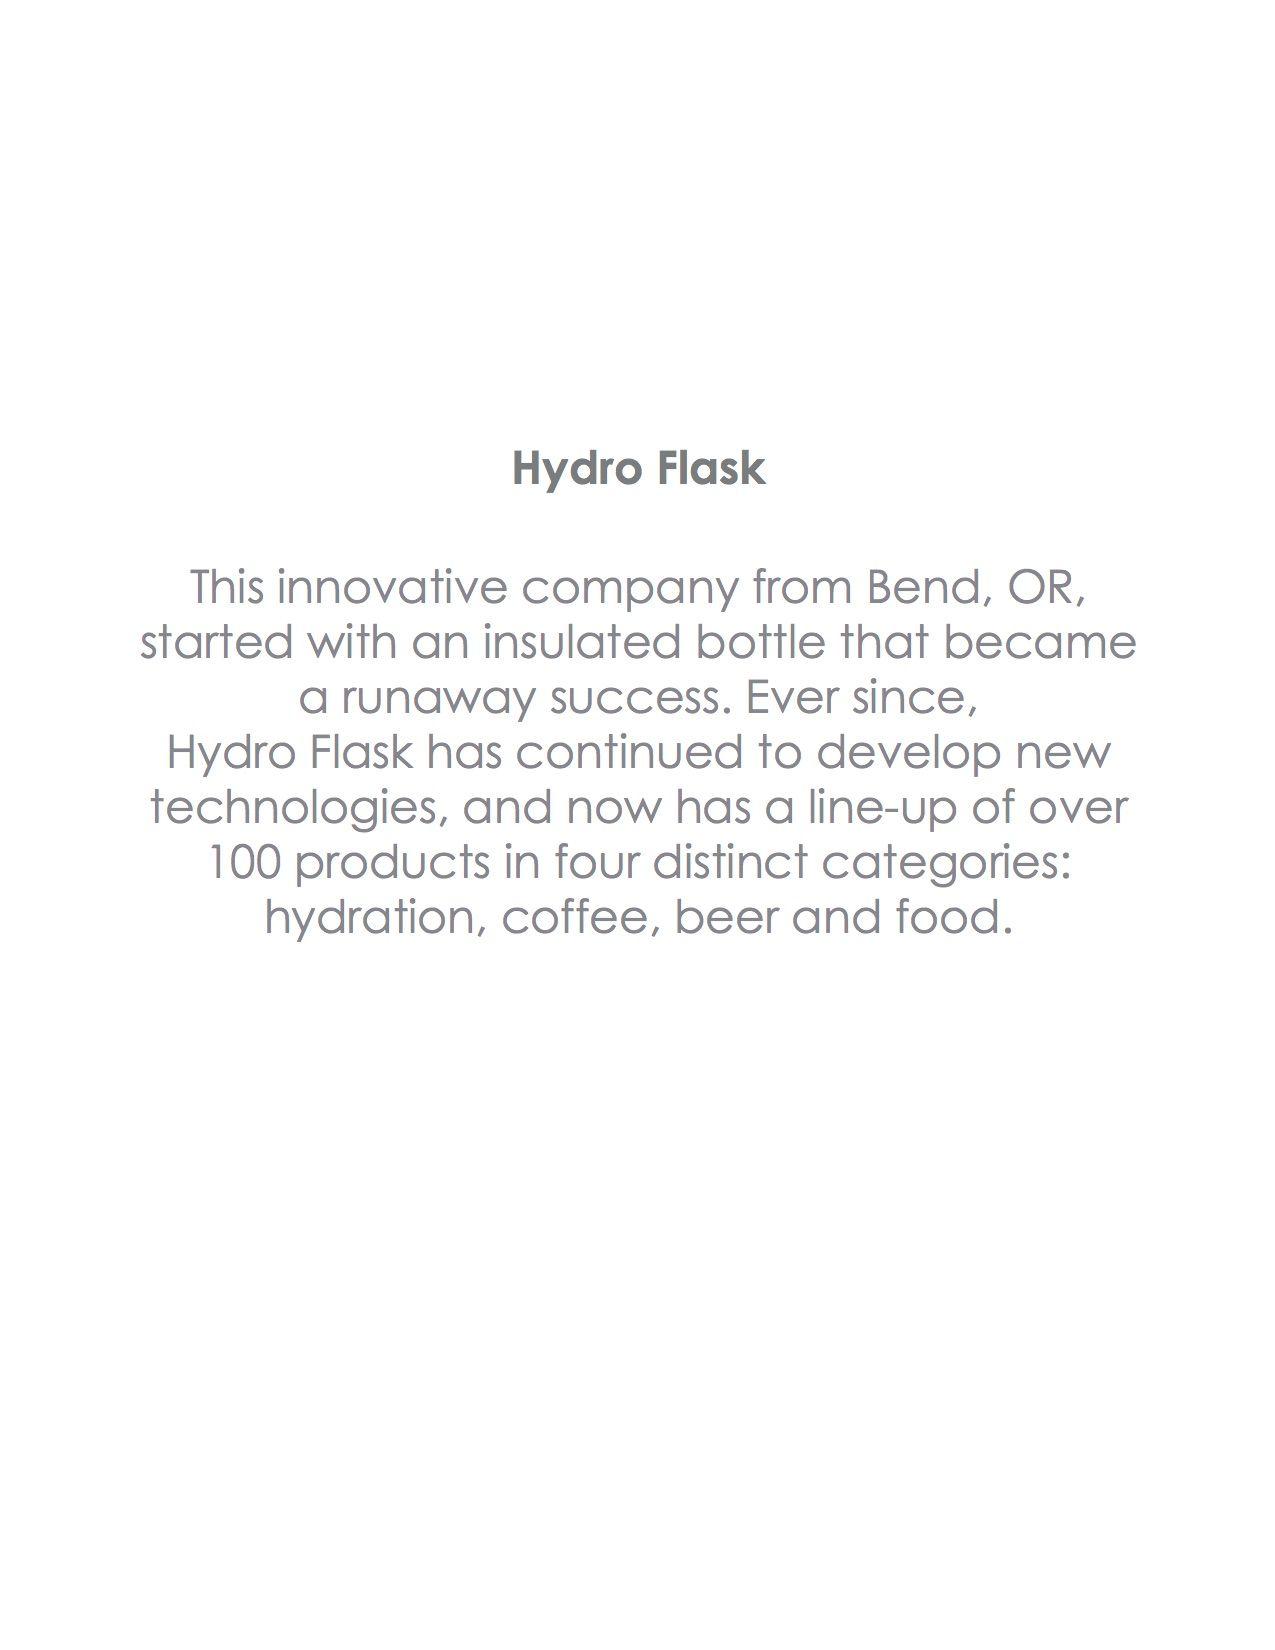 hydro_flask-2.jpg